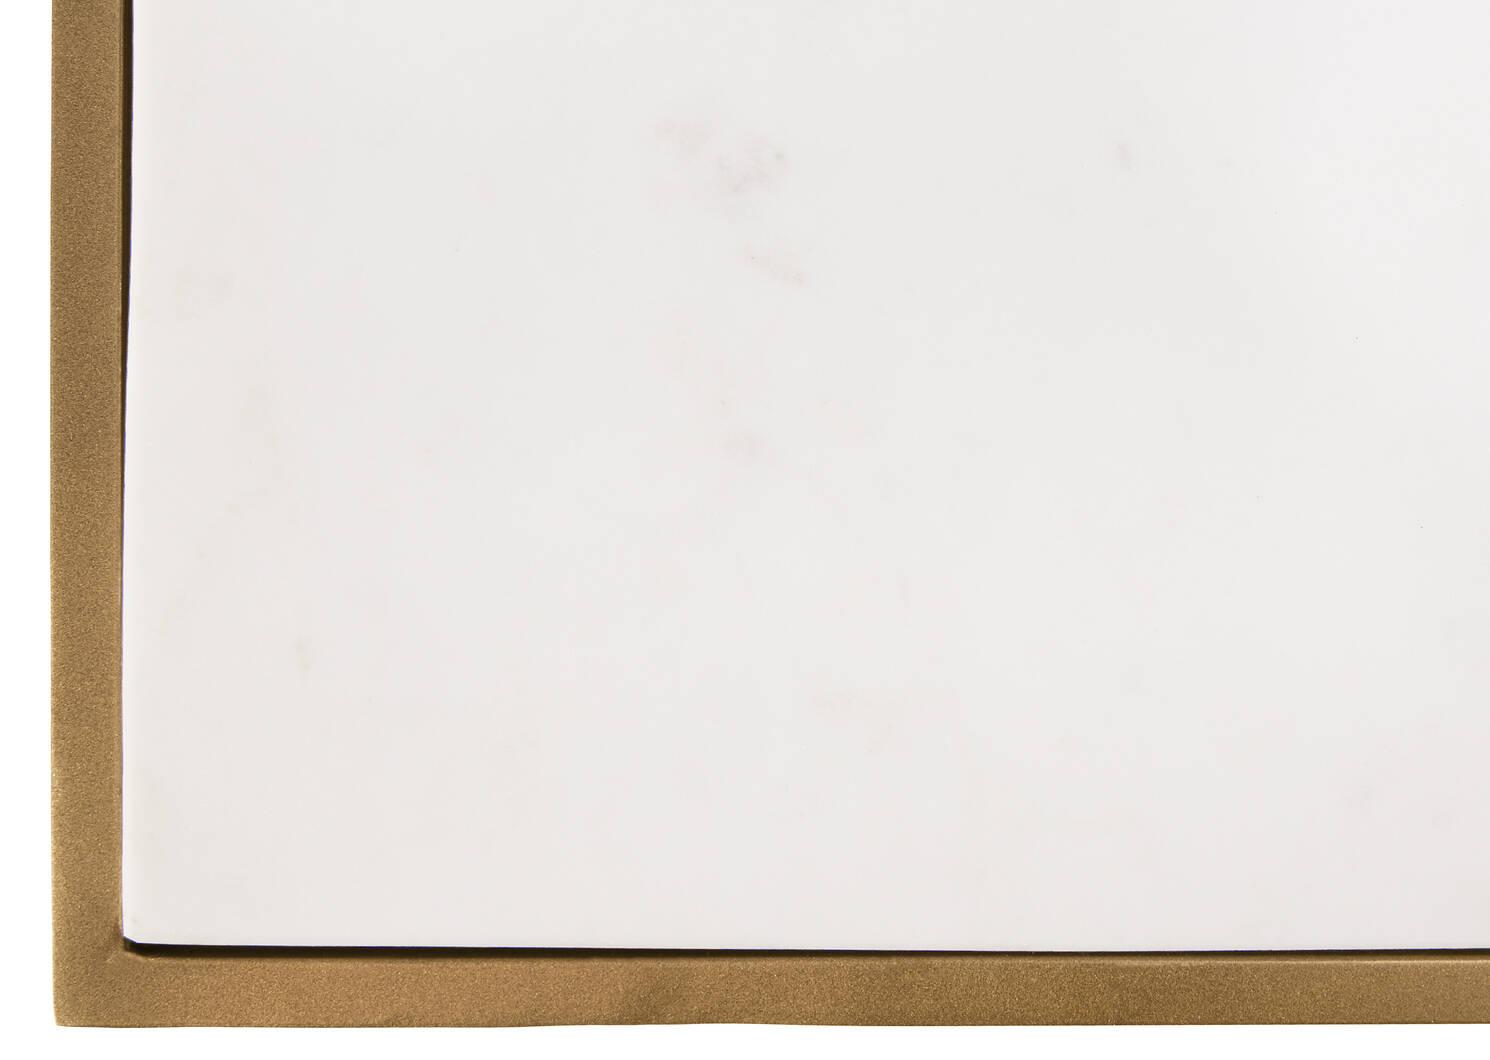 Table de bout Perkins -Simba laiton